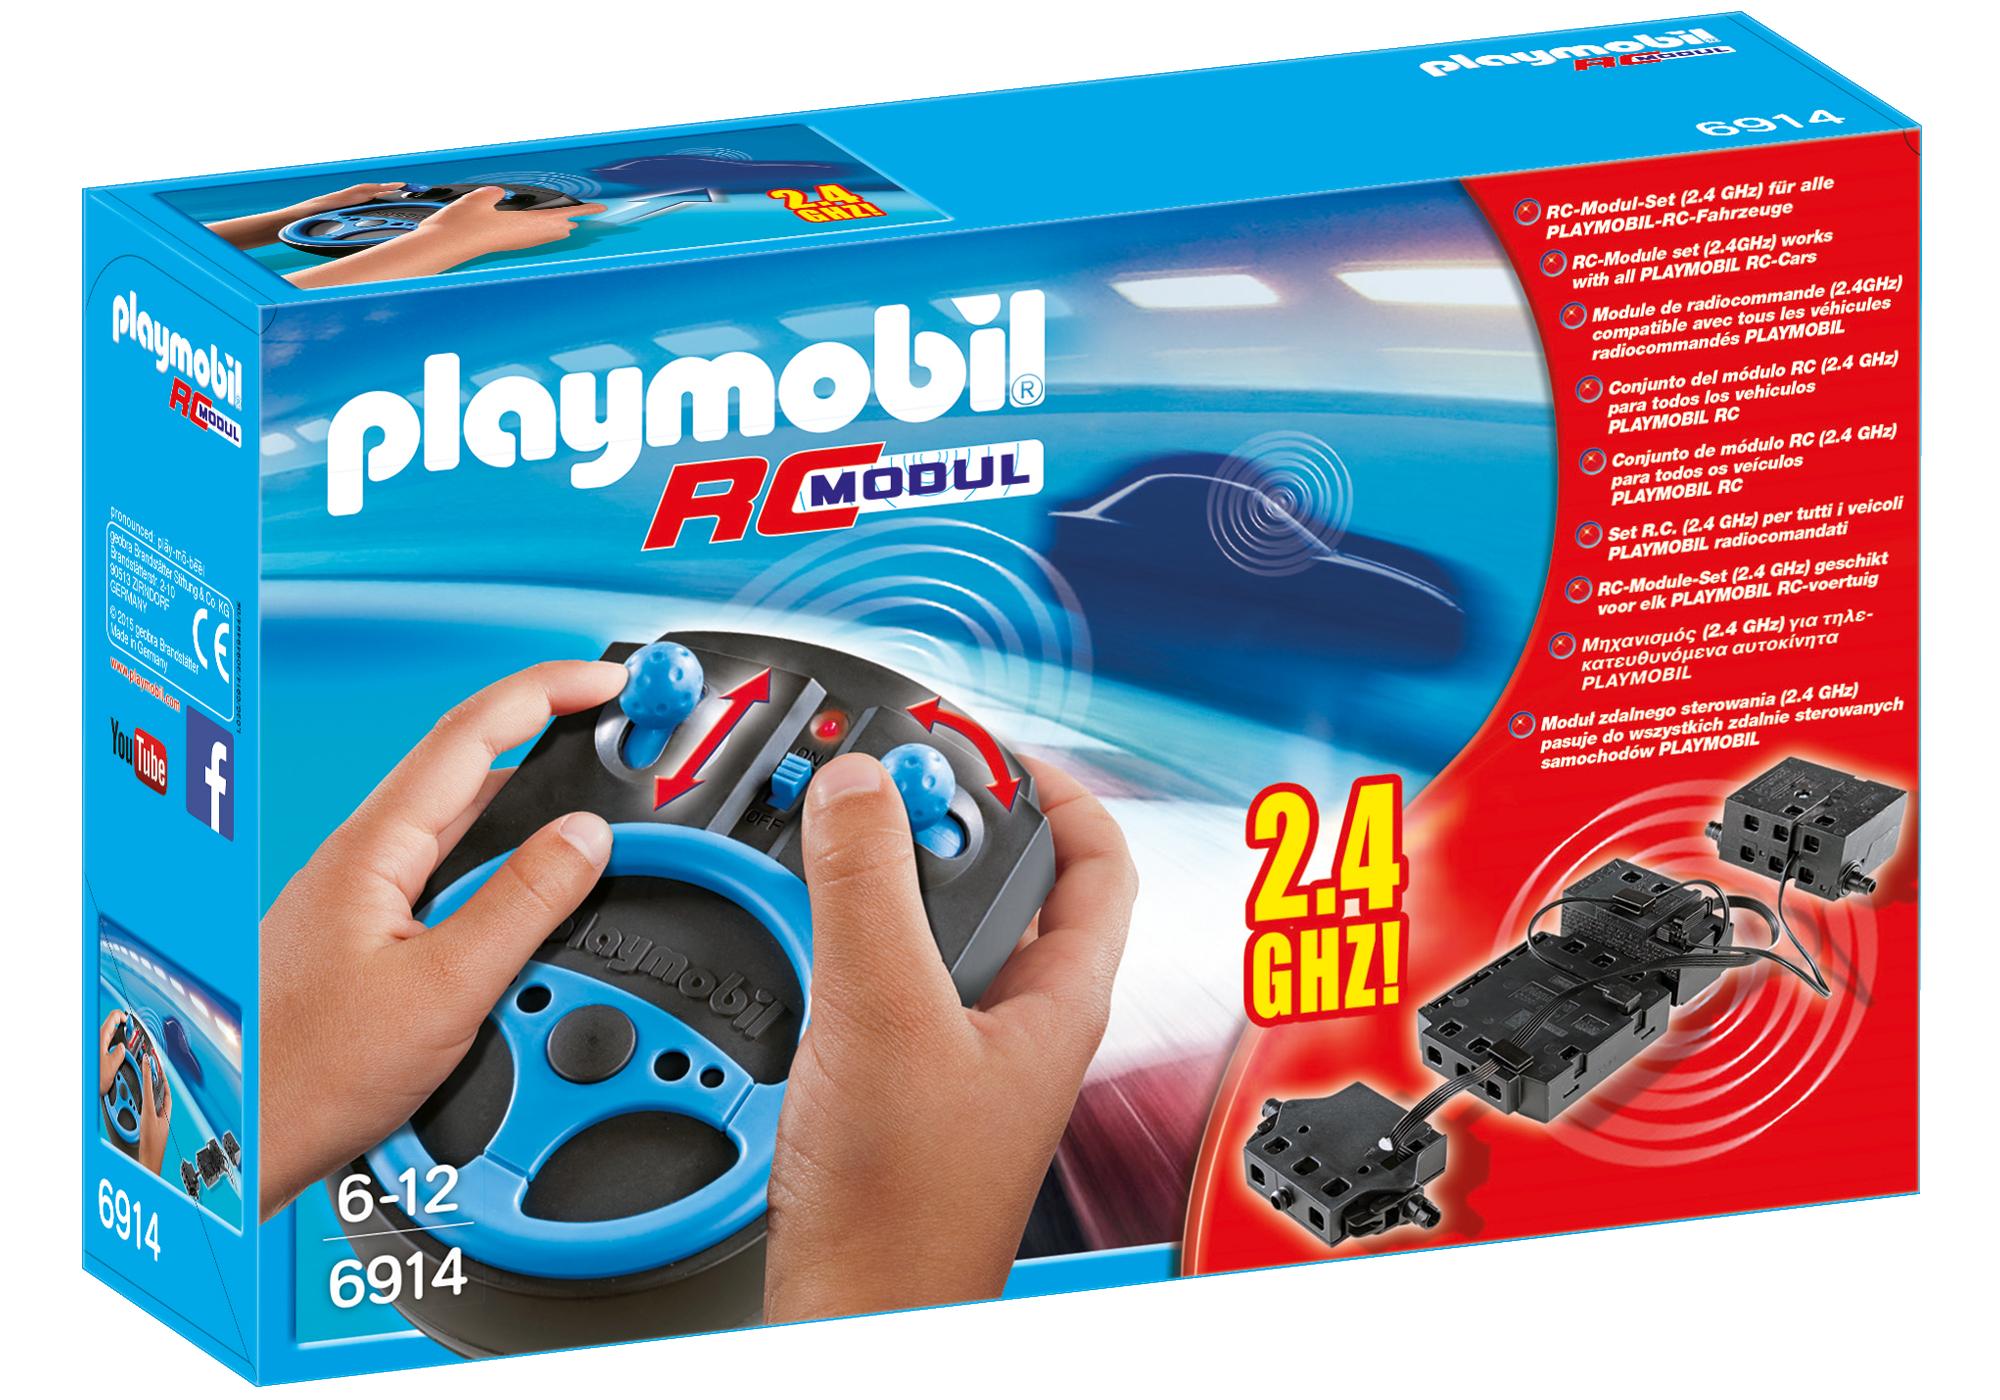 http://media.playmobil.com/i/playmobil/6914_product_box_front/RC-Modul-Set 2,4 GHz